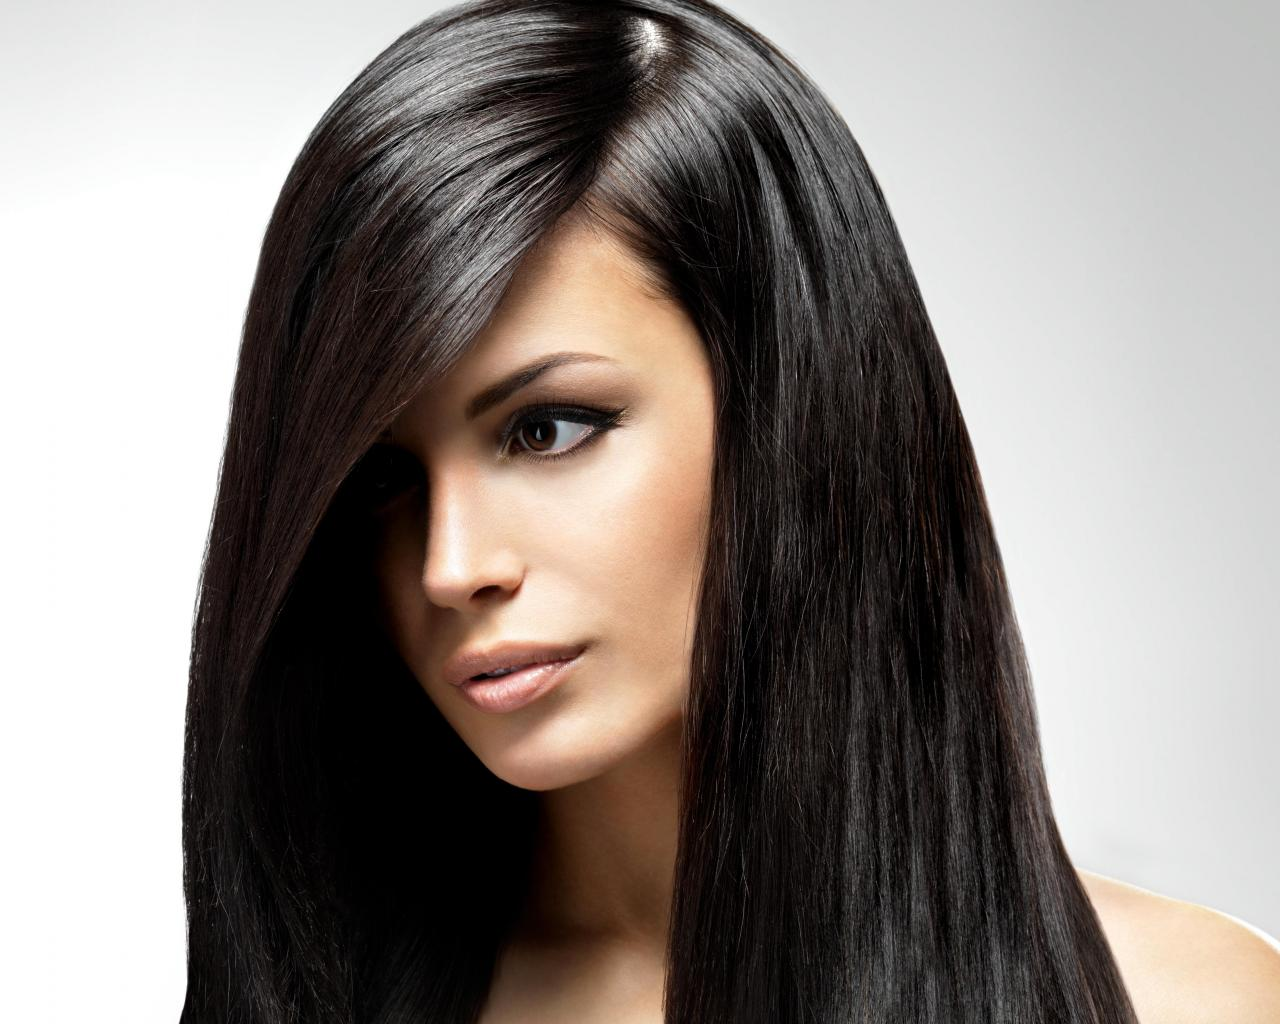 Wallpaper Tags: lovely sensual girl face dreamer beautiful woman long hair hair photography eyes lips brunette beauty lady female